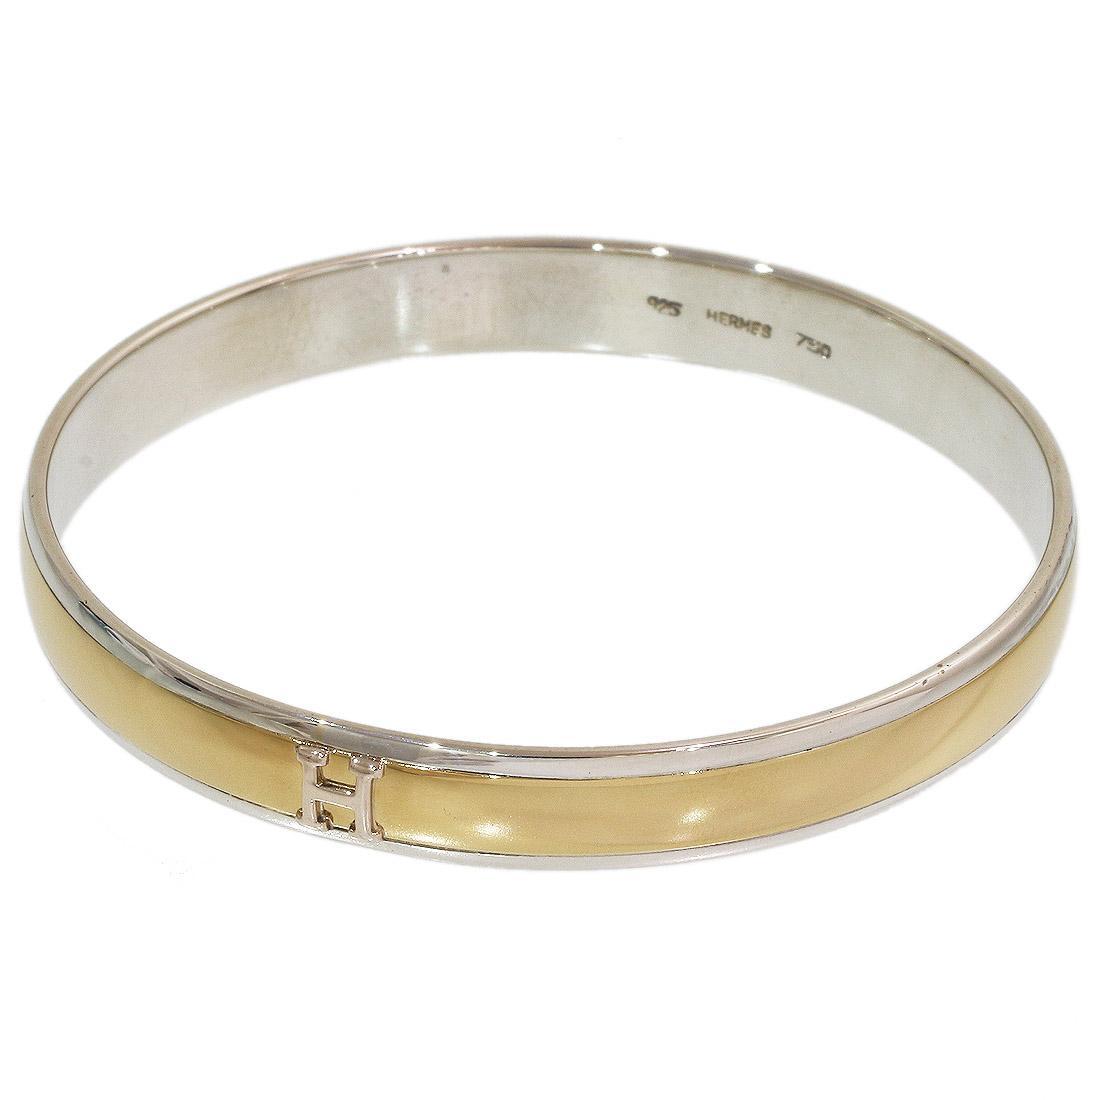 df6598e24 Hermes H Logo Design Bangle Bracelet Sterling Silver 925 / 18K ...